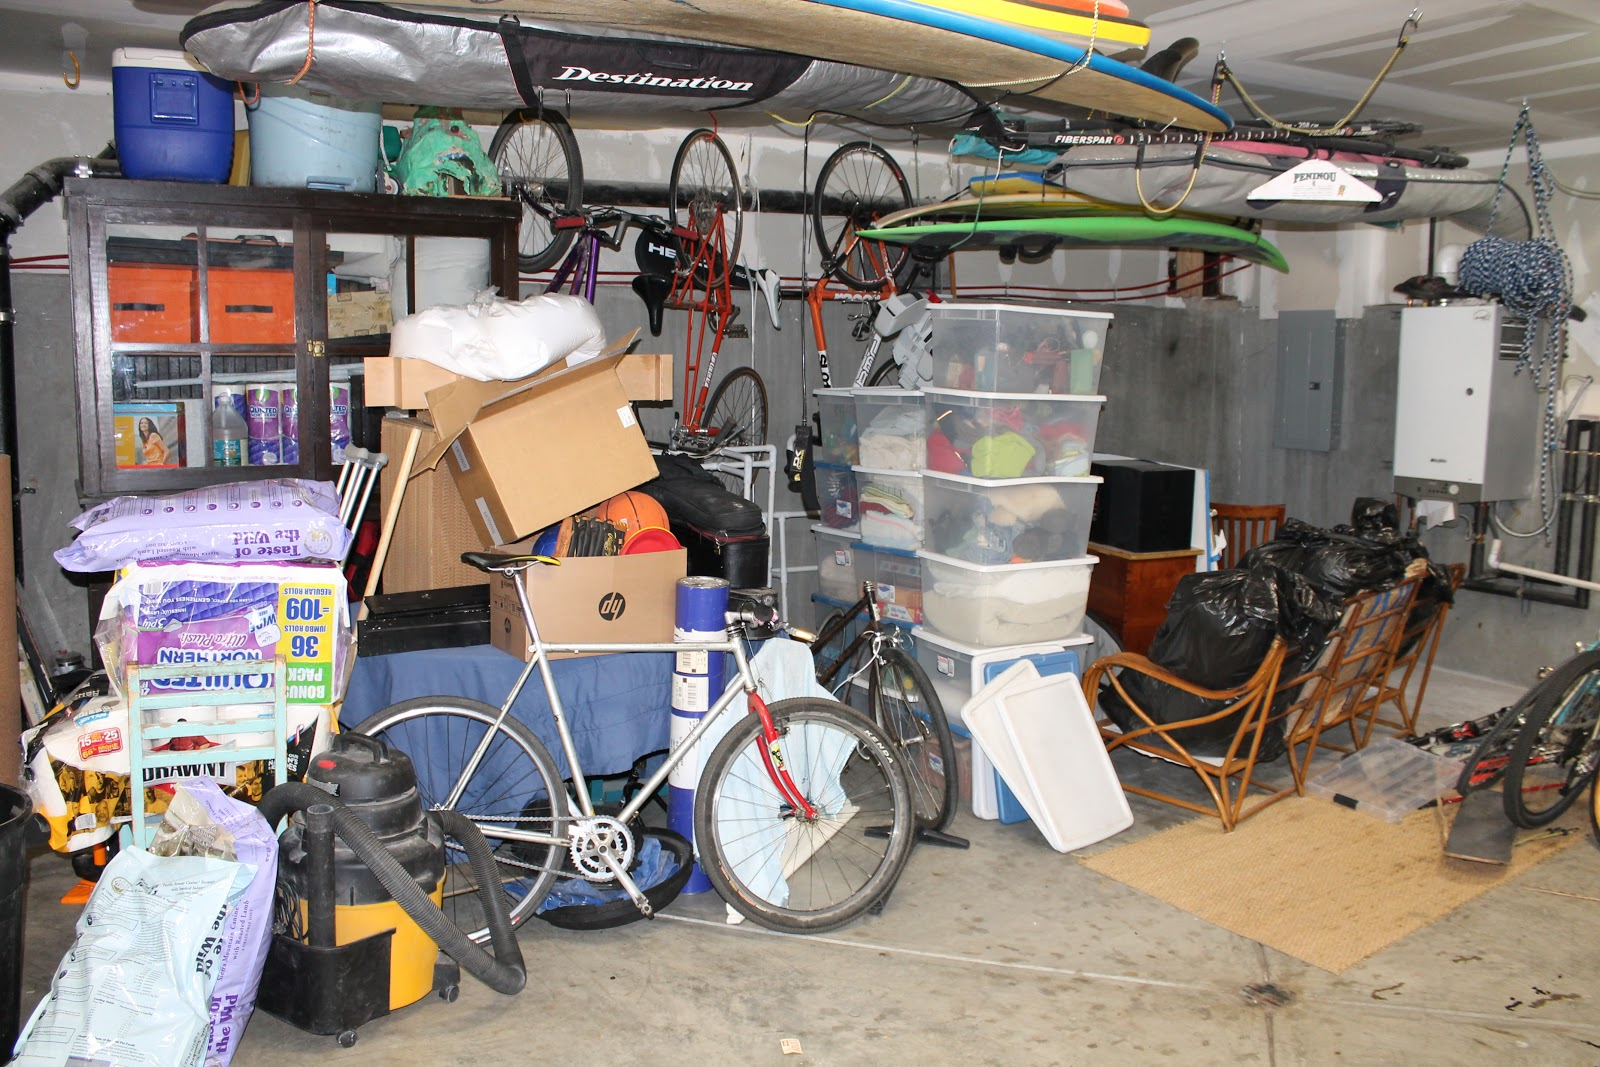 garage sale ideas organize - The Shingled House A Very Messy Garage